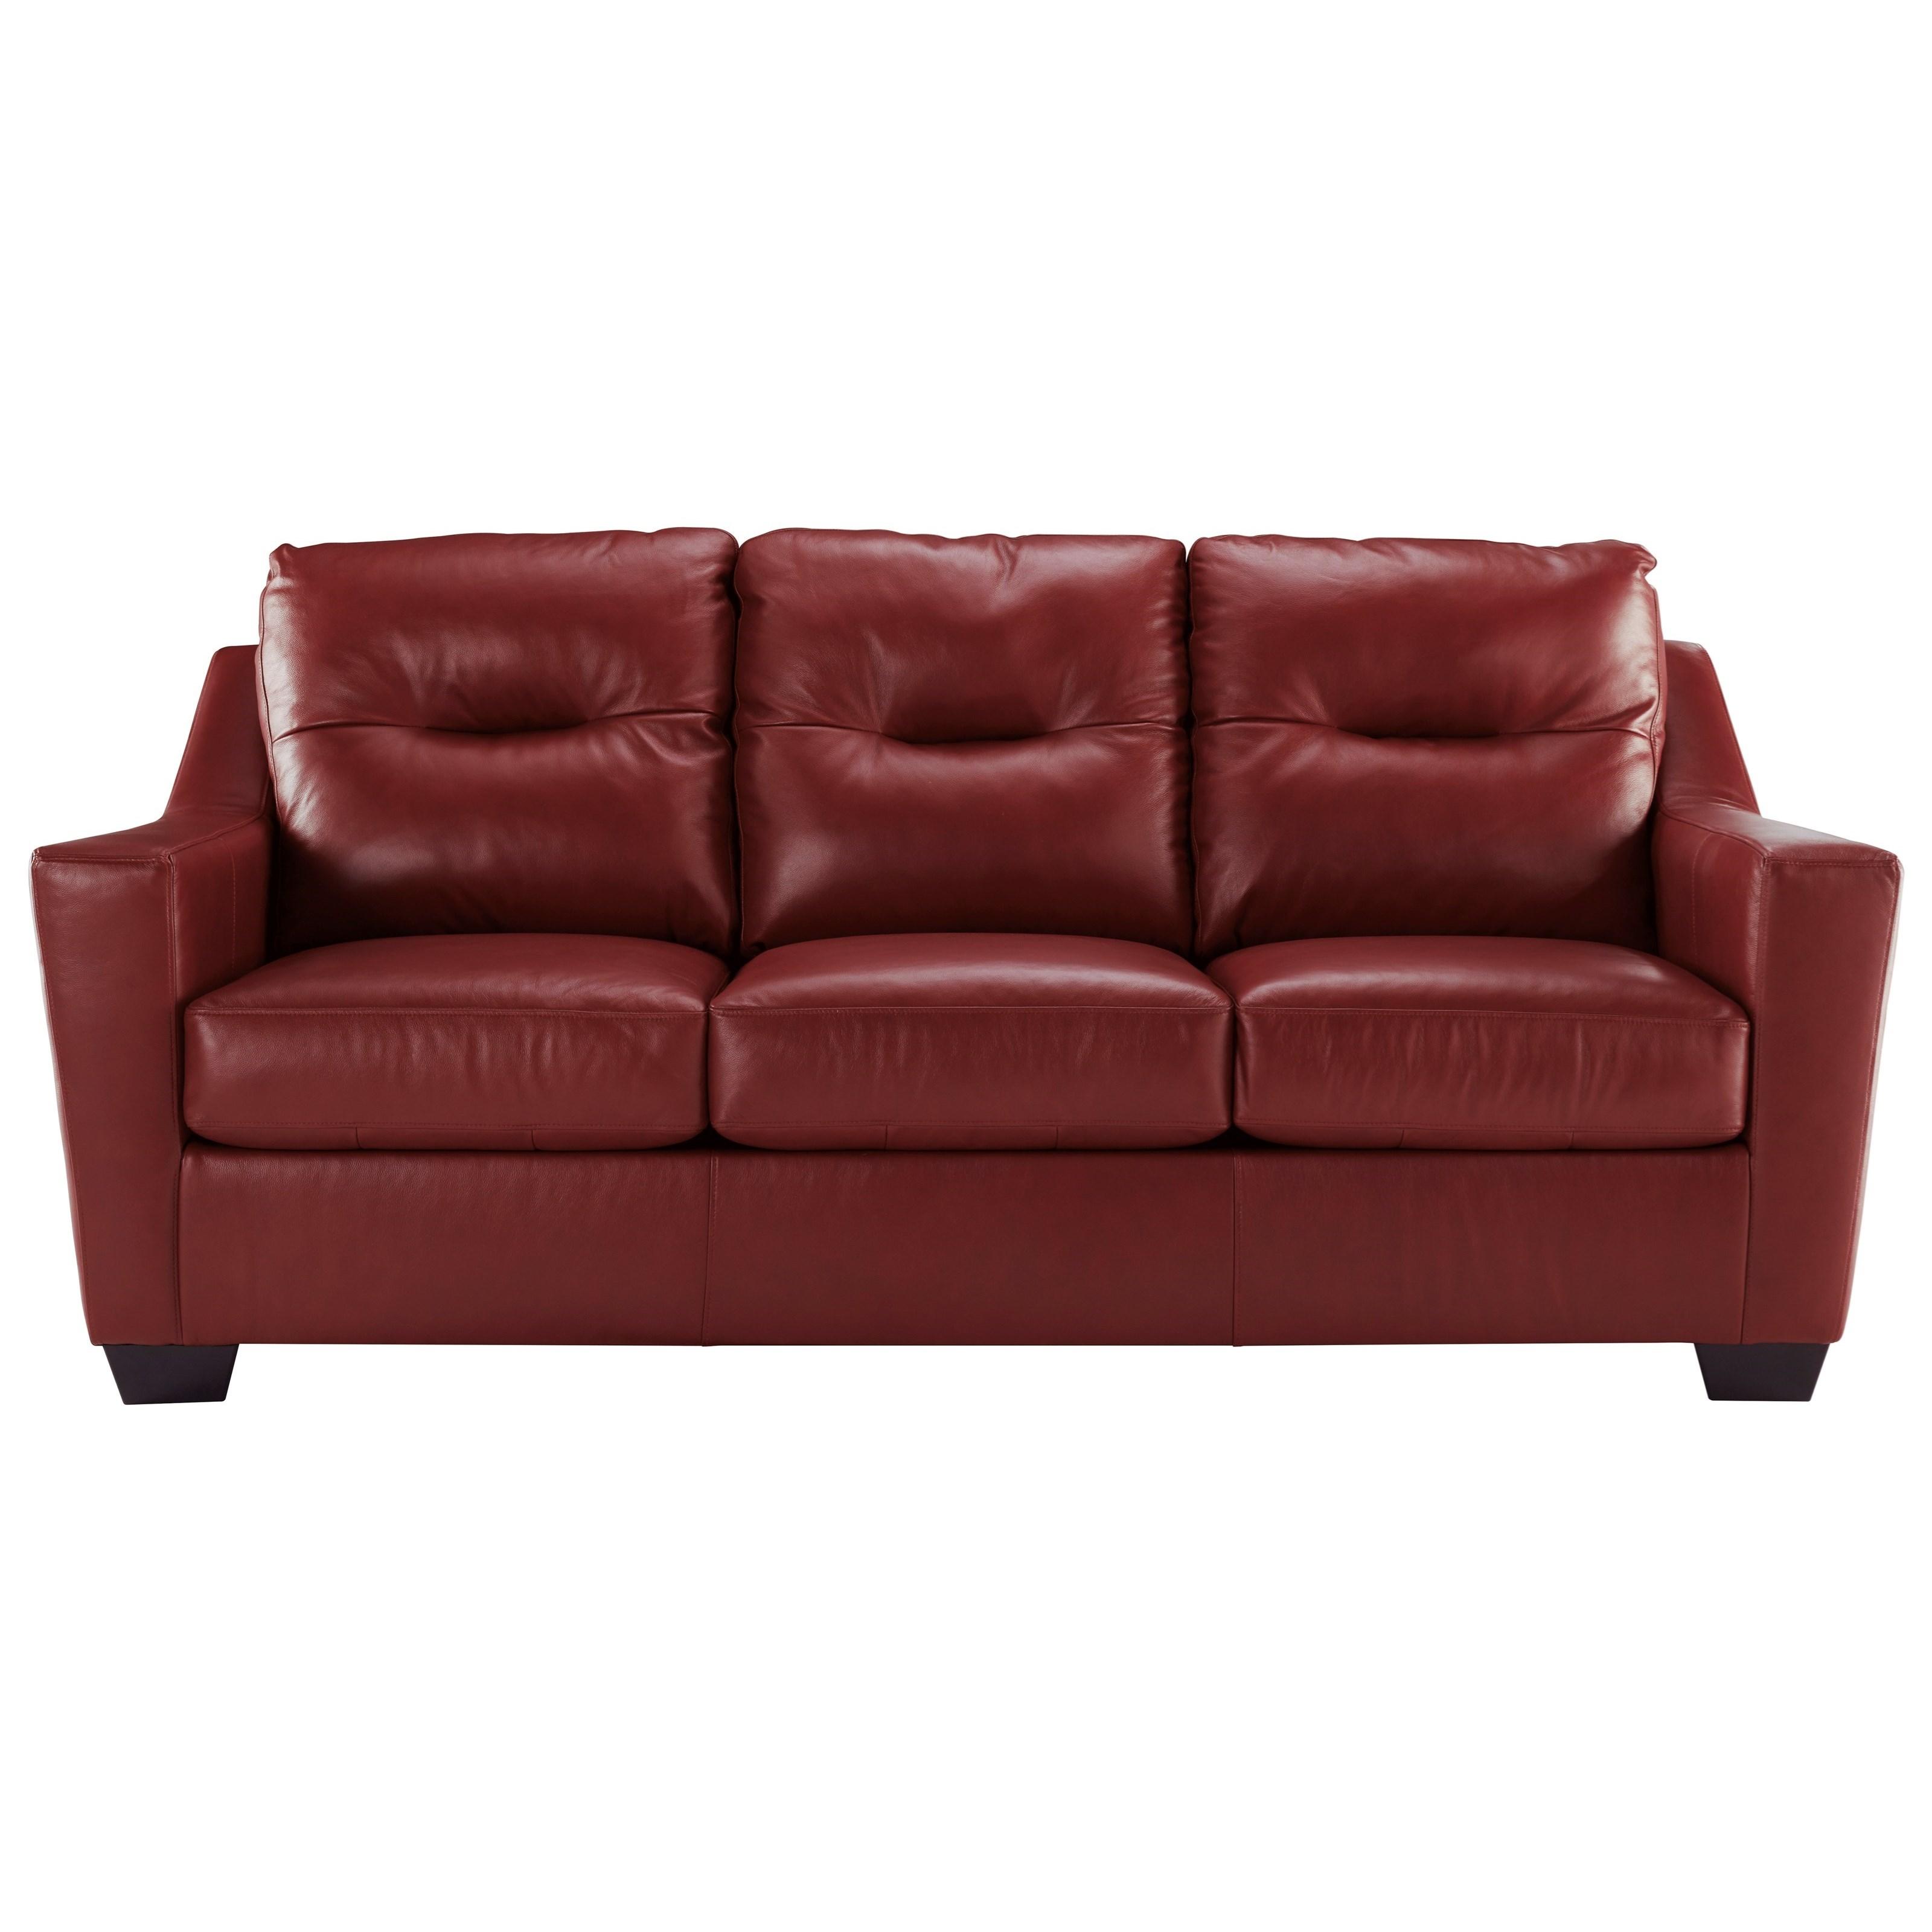 Signature Design By Ashley Kensbridge Leather Match Contemporary Sofa Royal Furniture Sofas